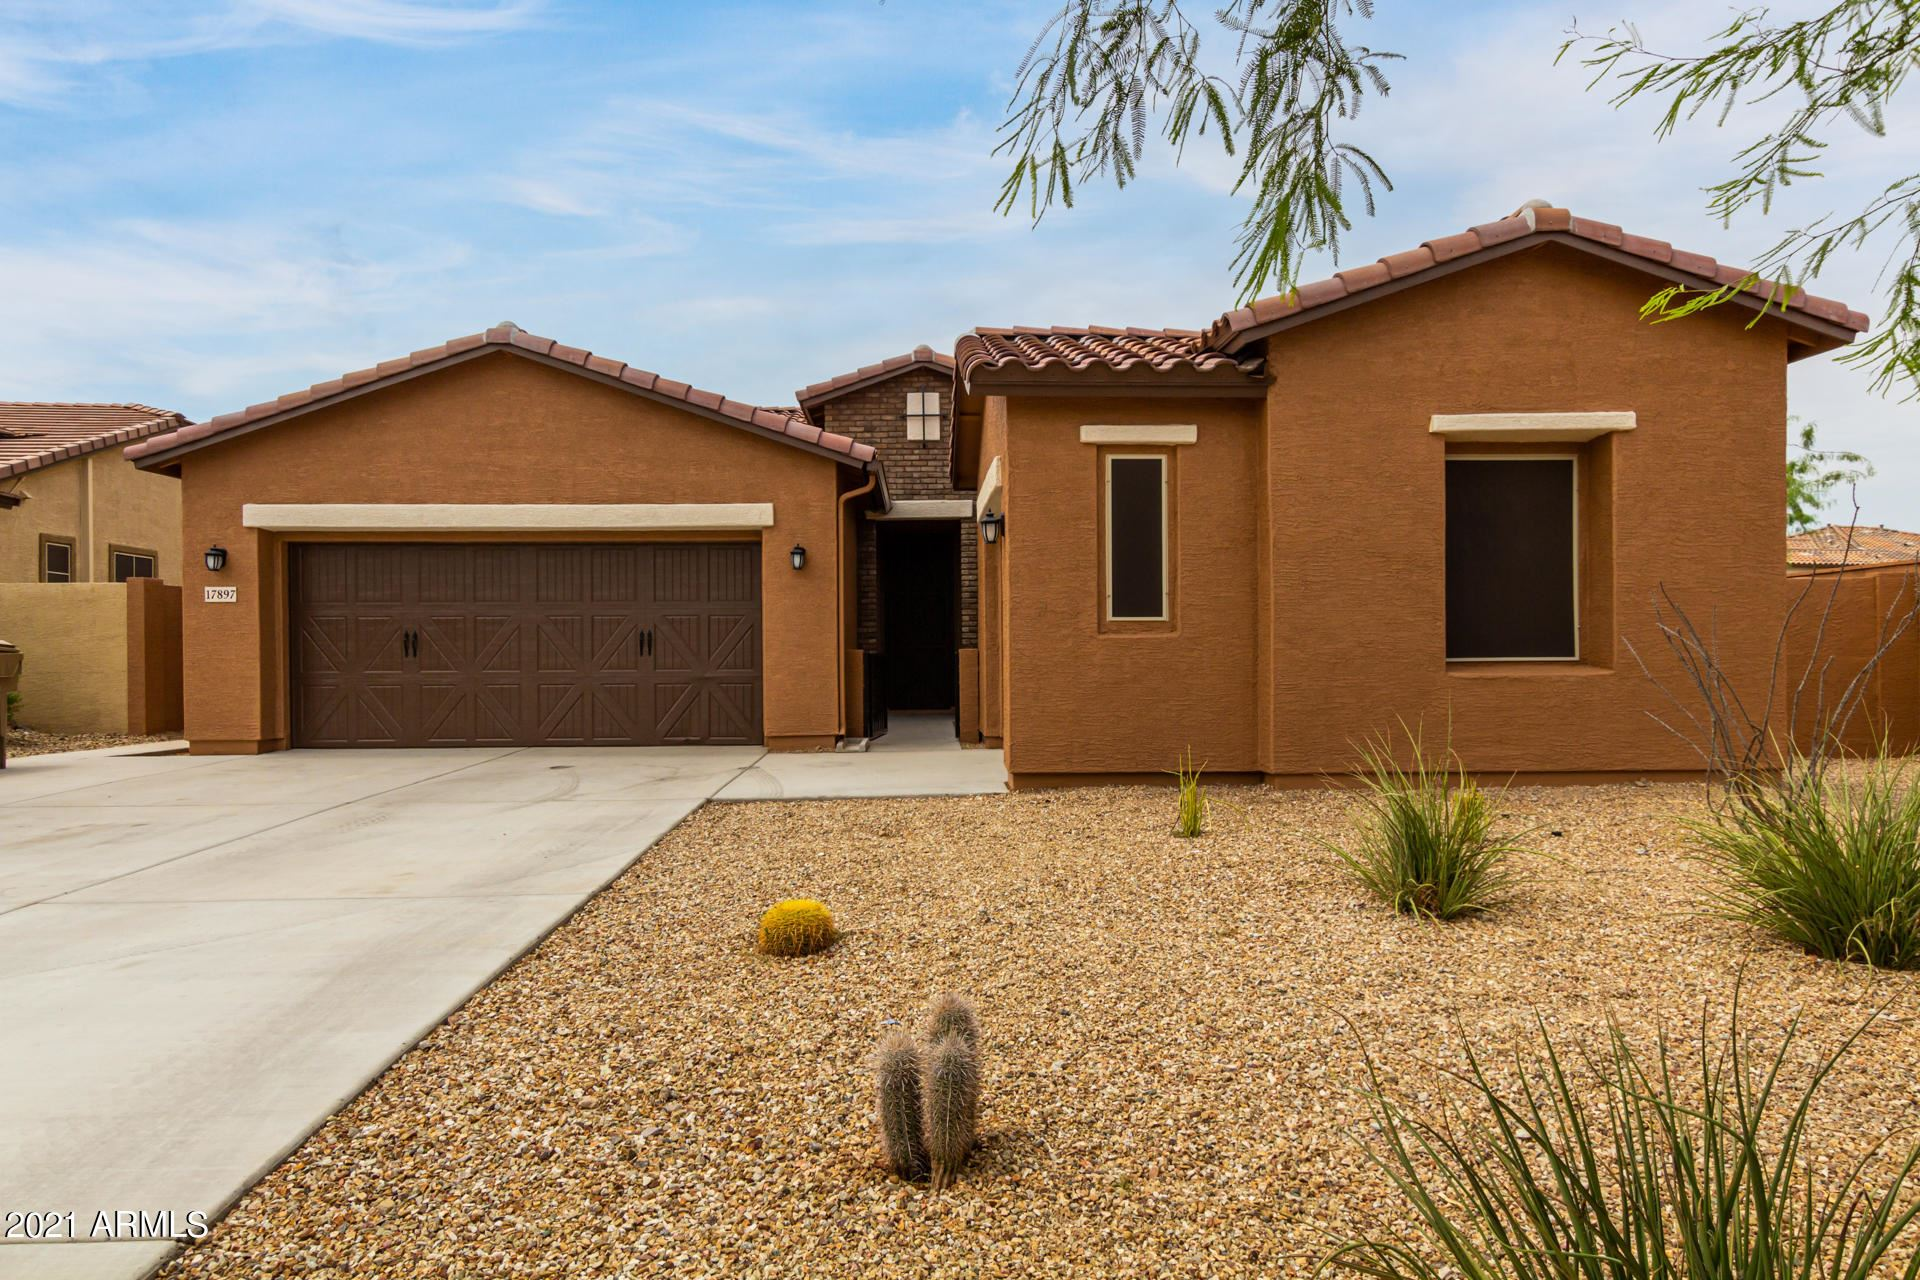 Photo of 17897 W Badger Way, Goodyear, AZ 85338 (MLS # 6268276)